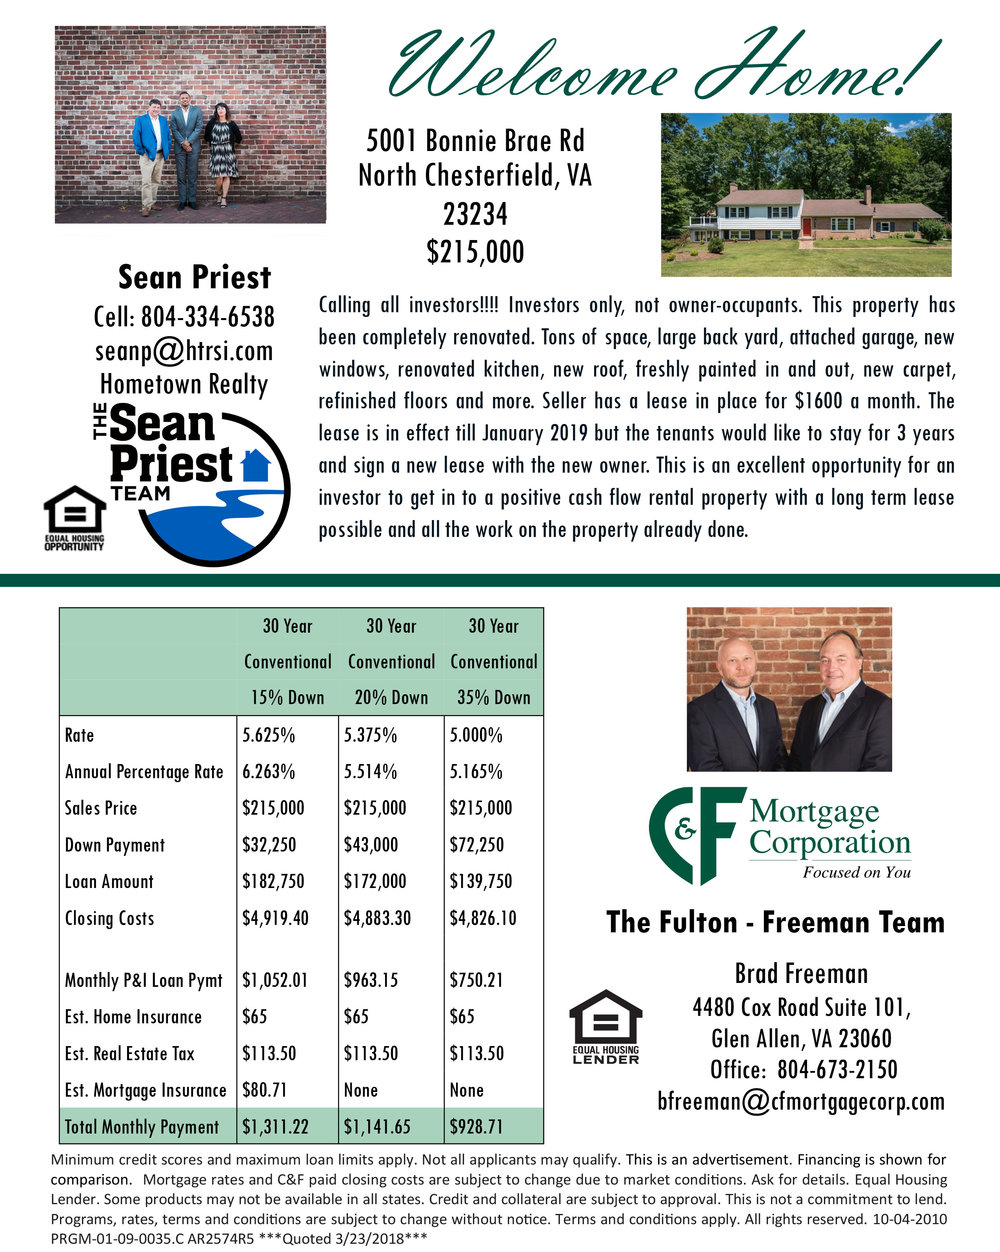 Sean Priest Investor Flyer 3-23-18.jpg